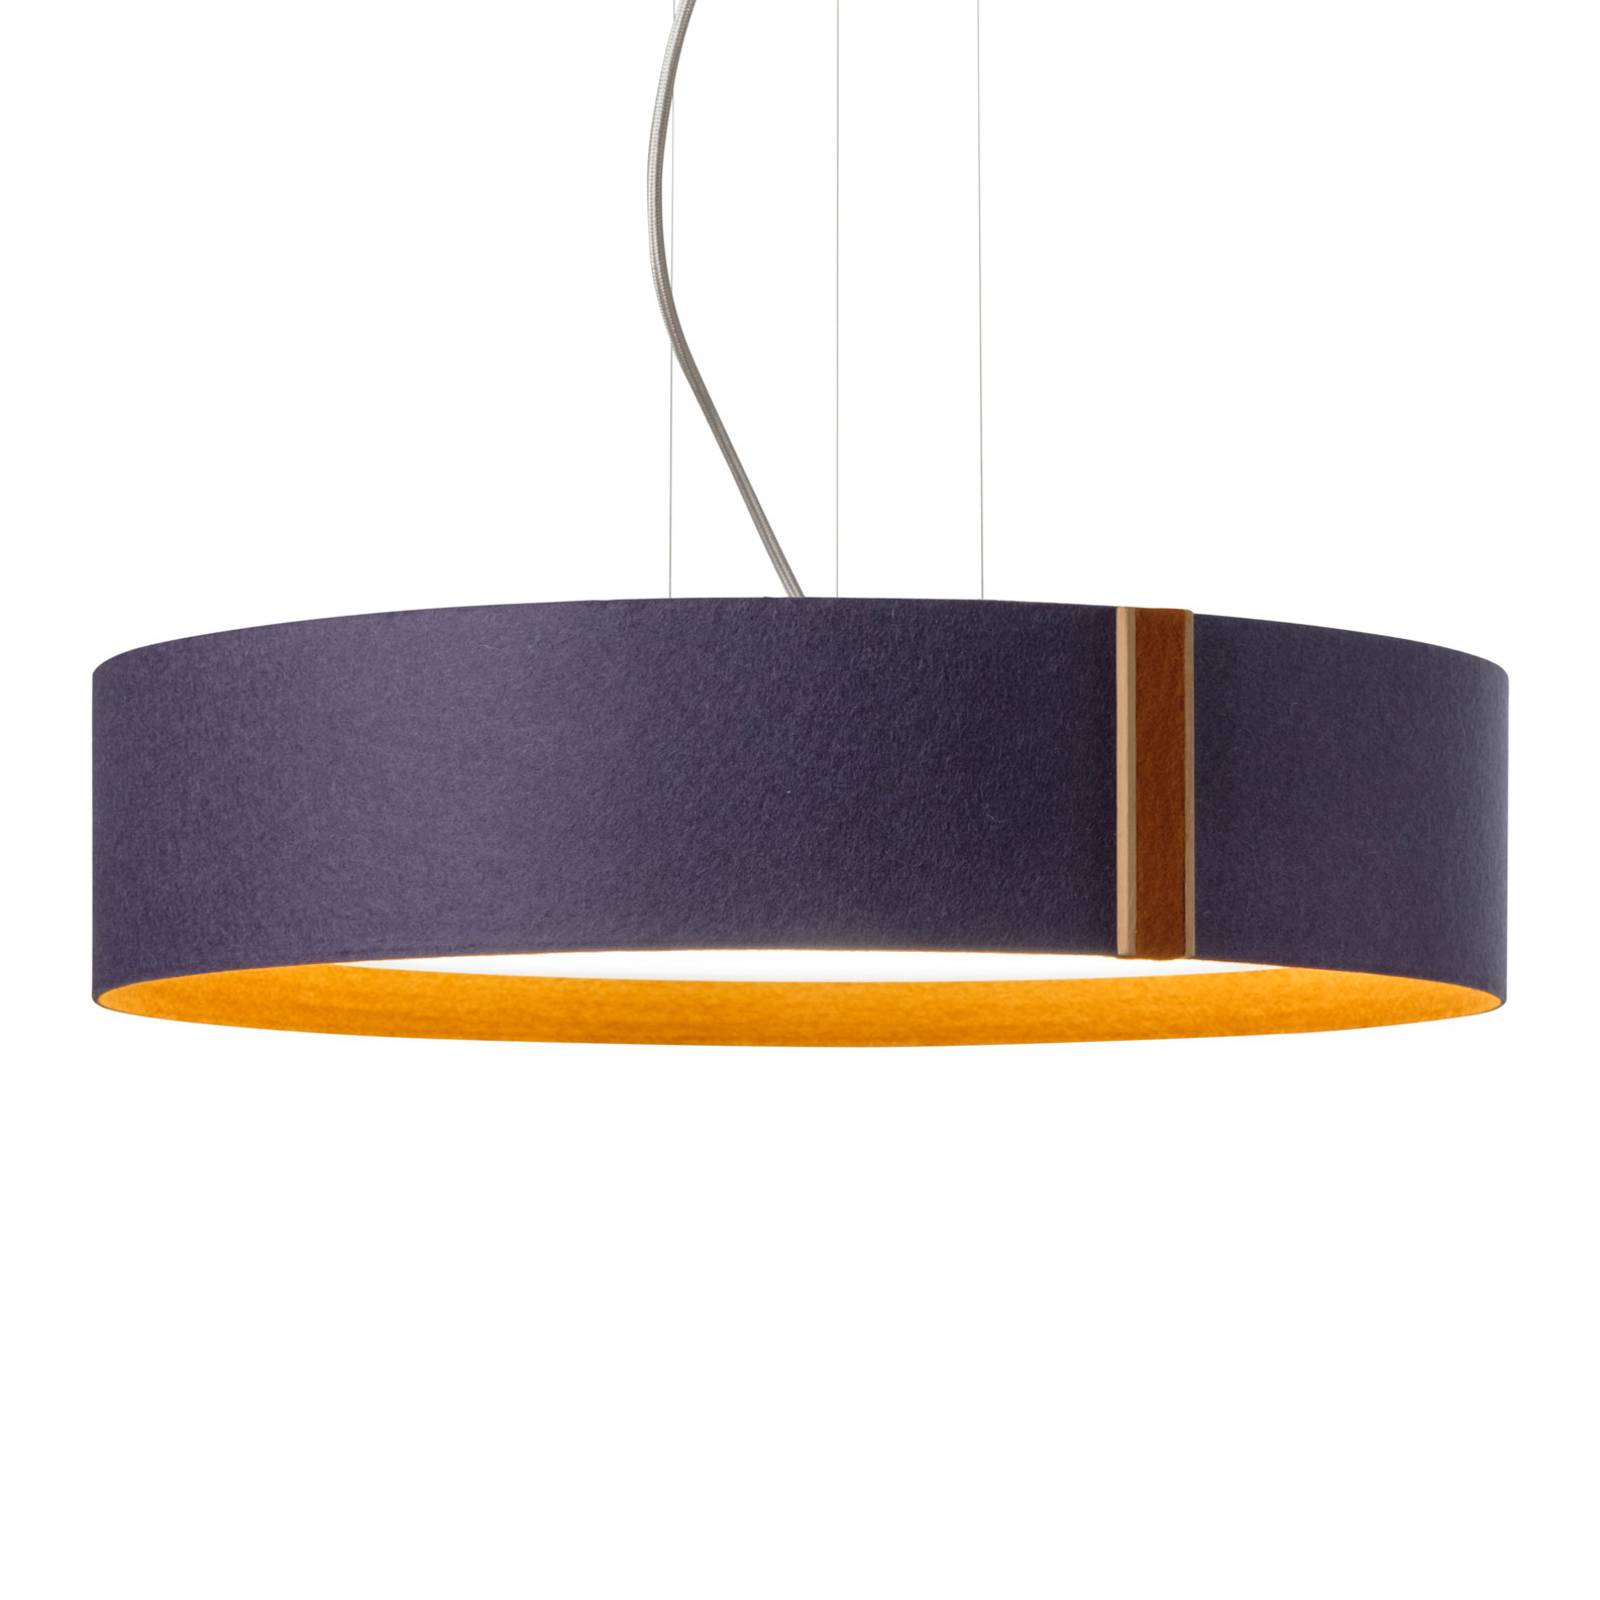 LED-riippuvalaisin LARAfelt, Ø 55cm, indigo/kaneli